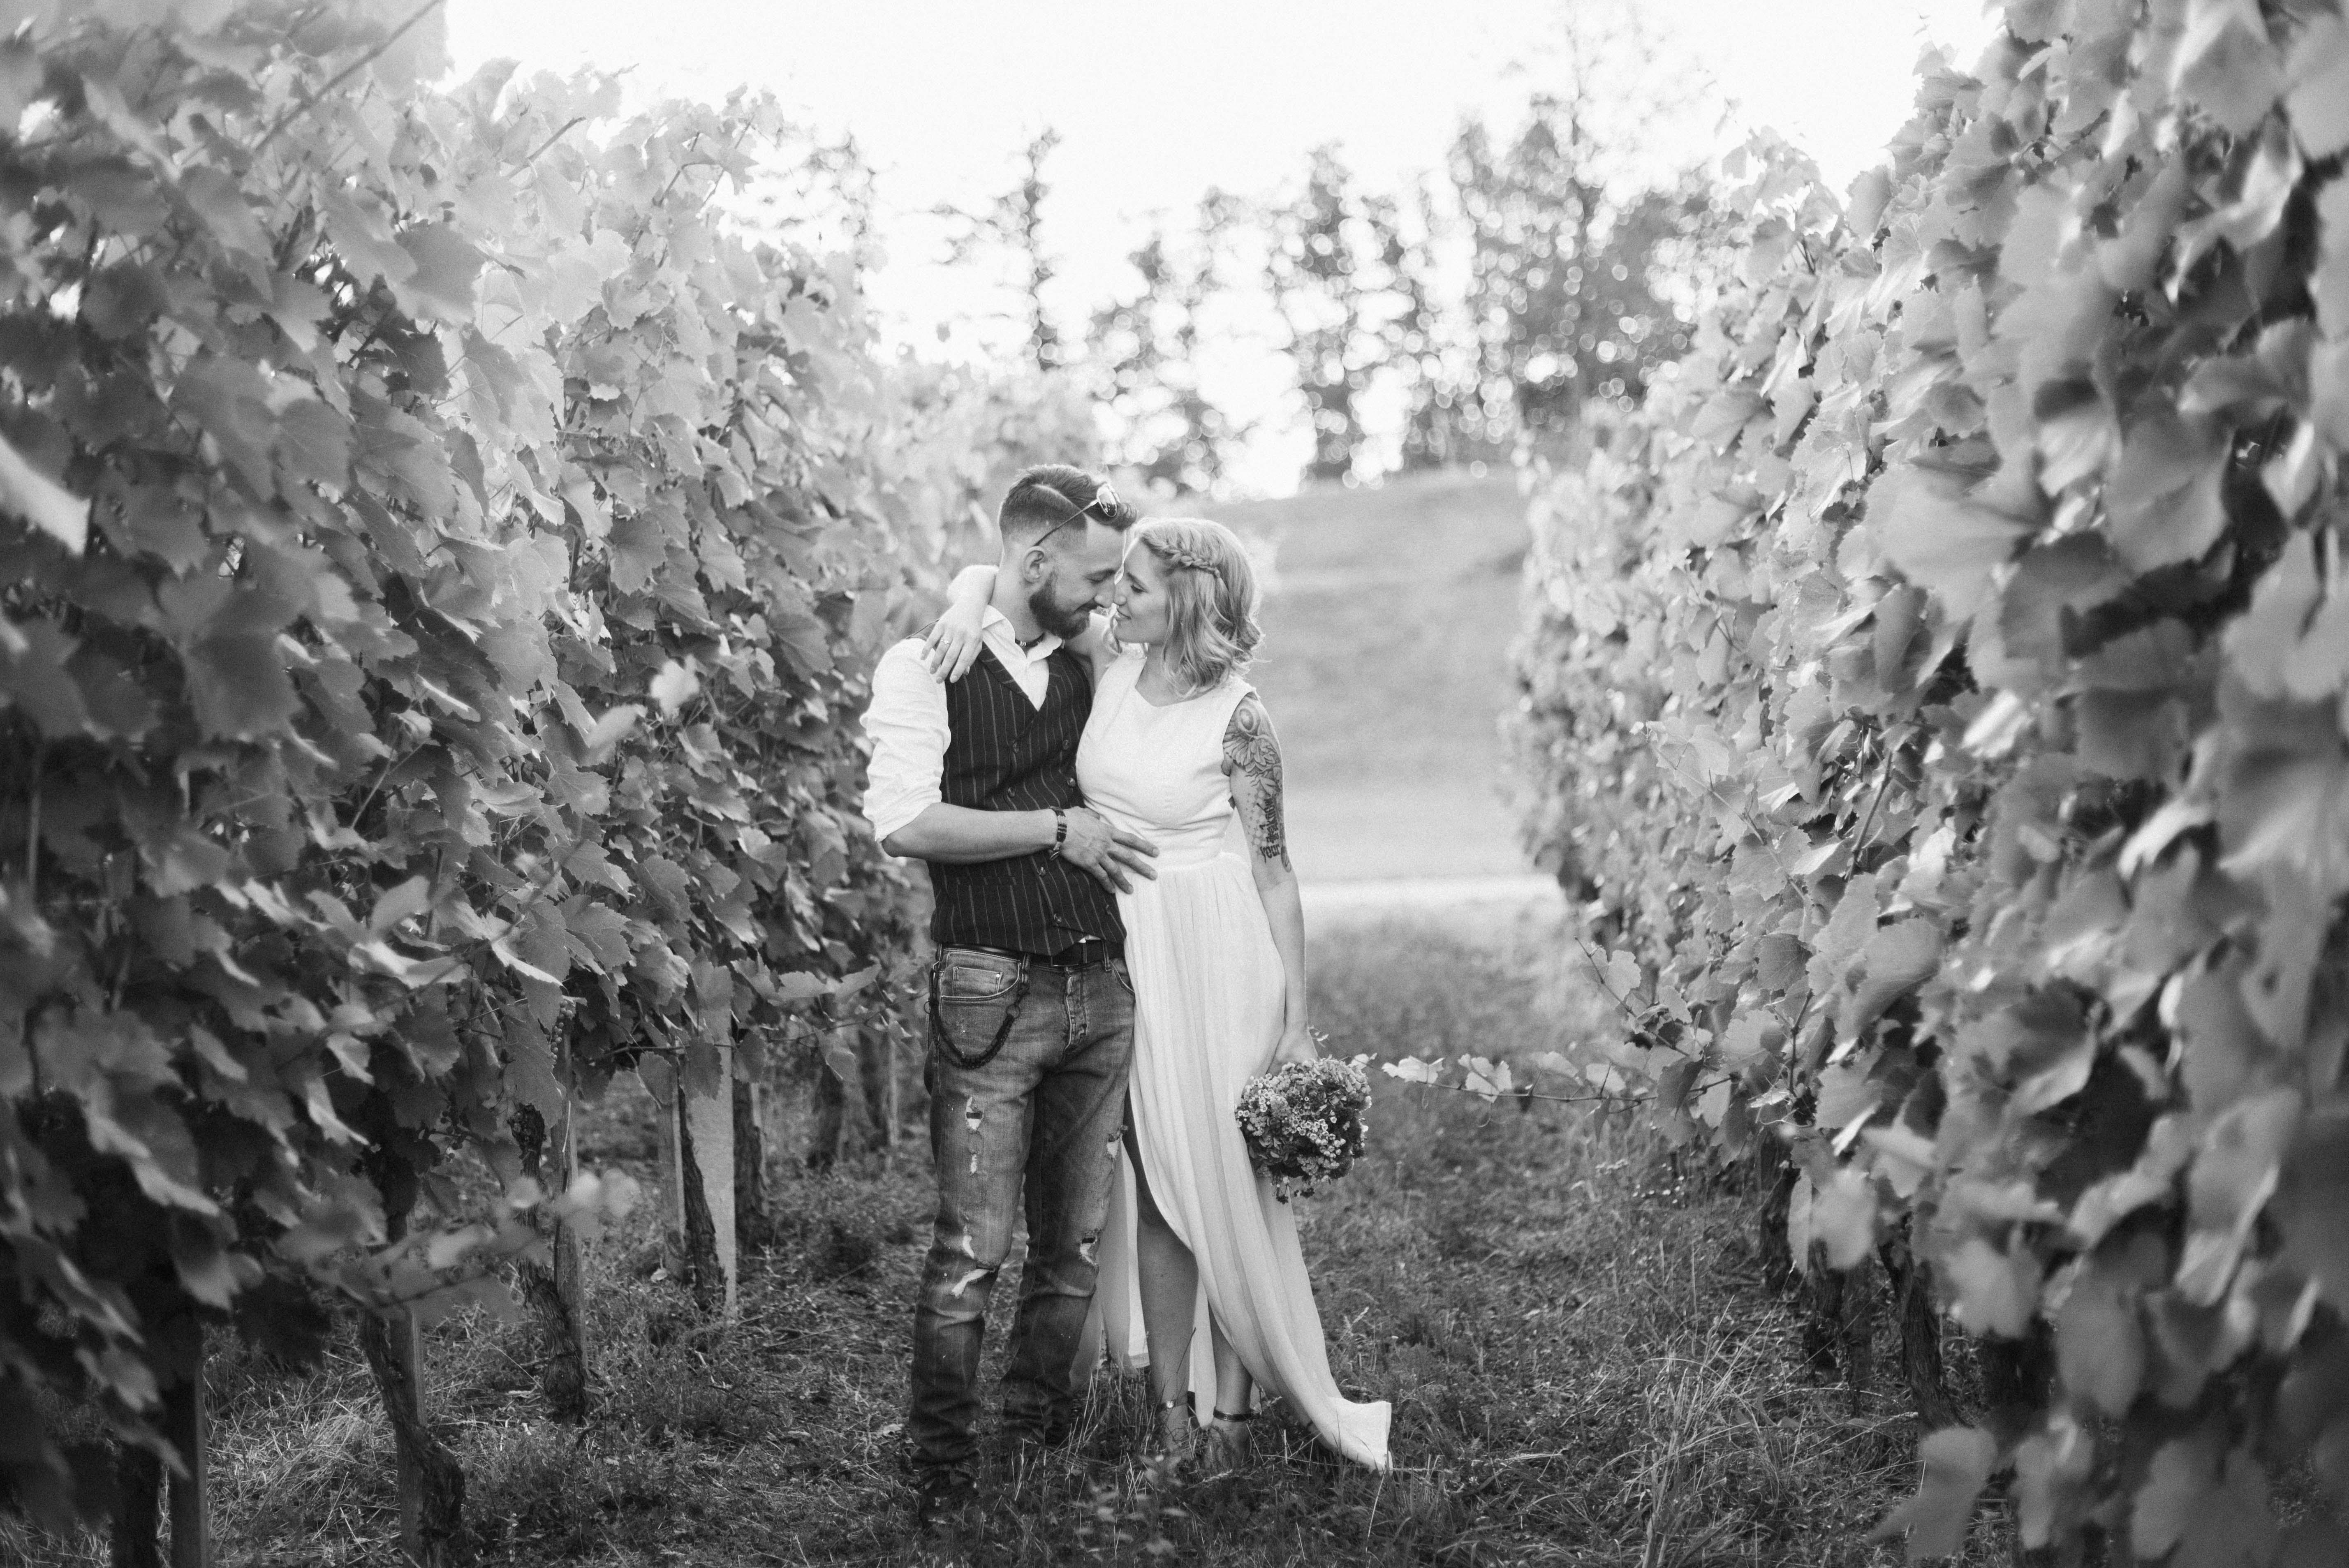 Napa Valley Wedding | Neža Reisner - Wedding Photographer